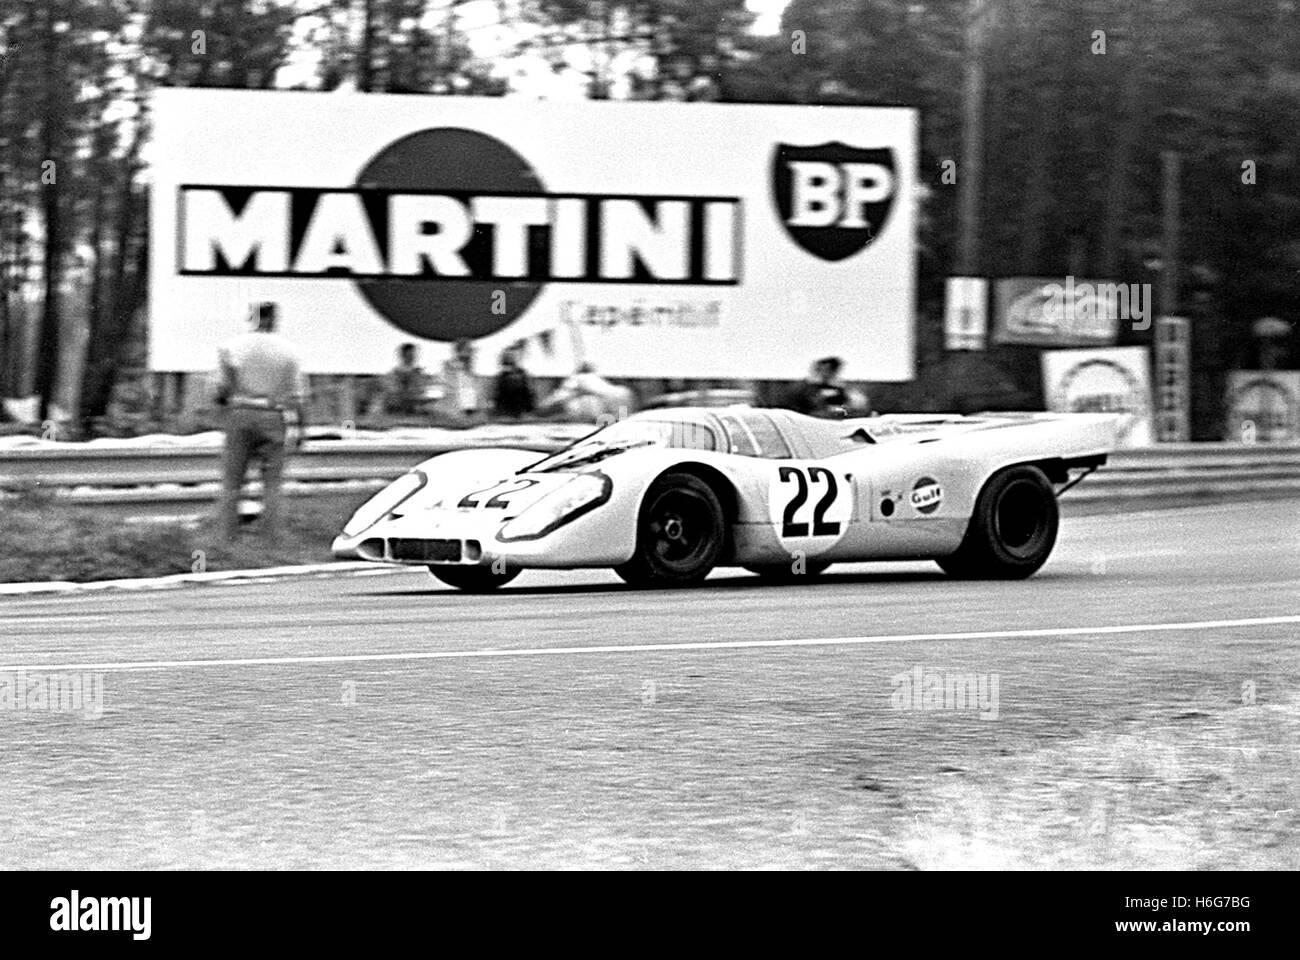 Porsche 917 of Hailwood Le Mans 1970 - Stock Image